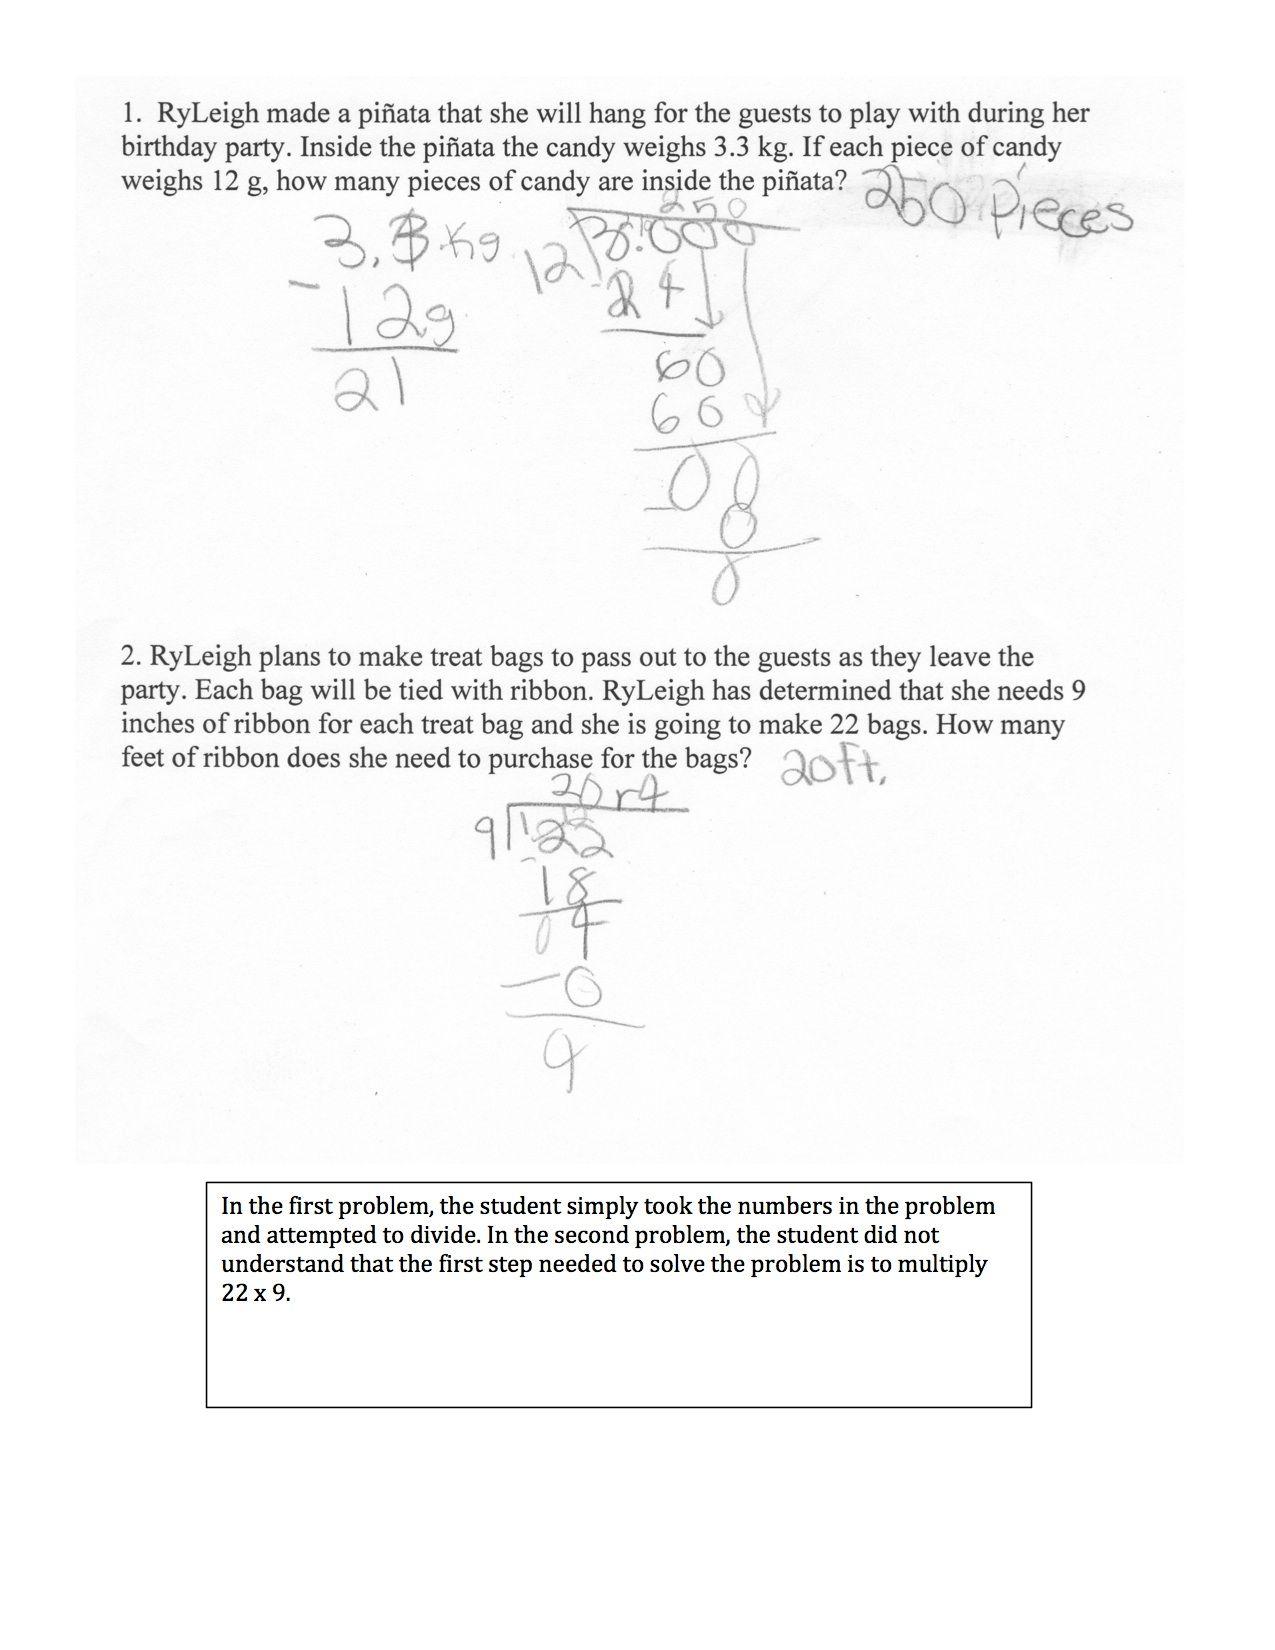 Metric Measurement Conversion Worksheet Answers